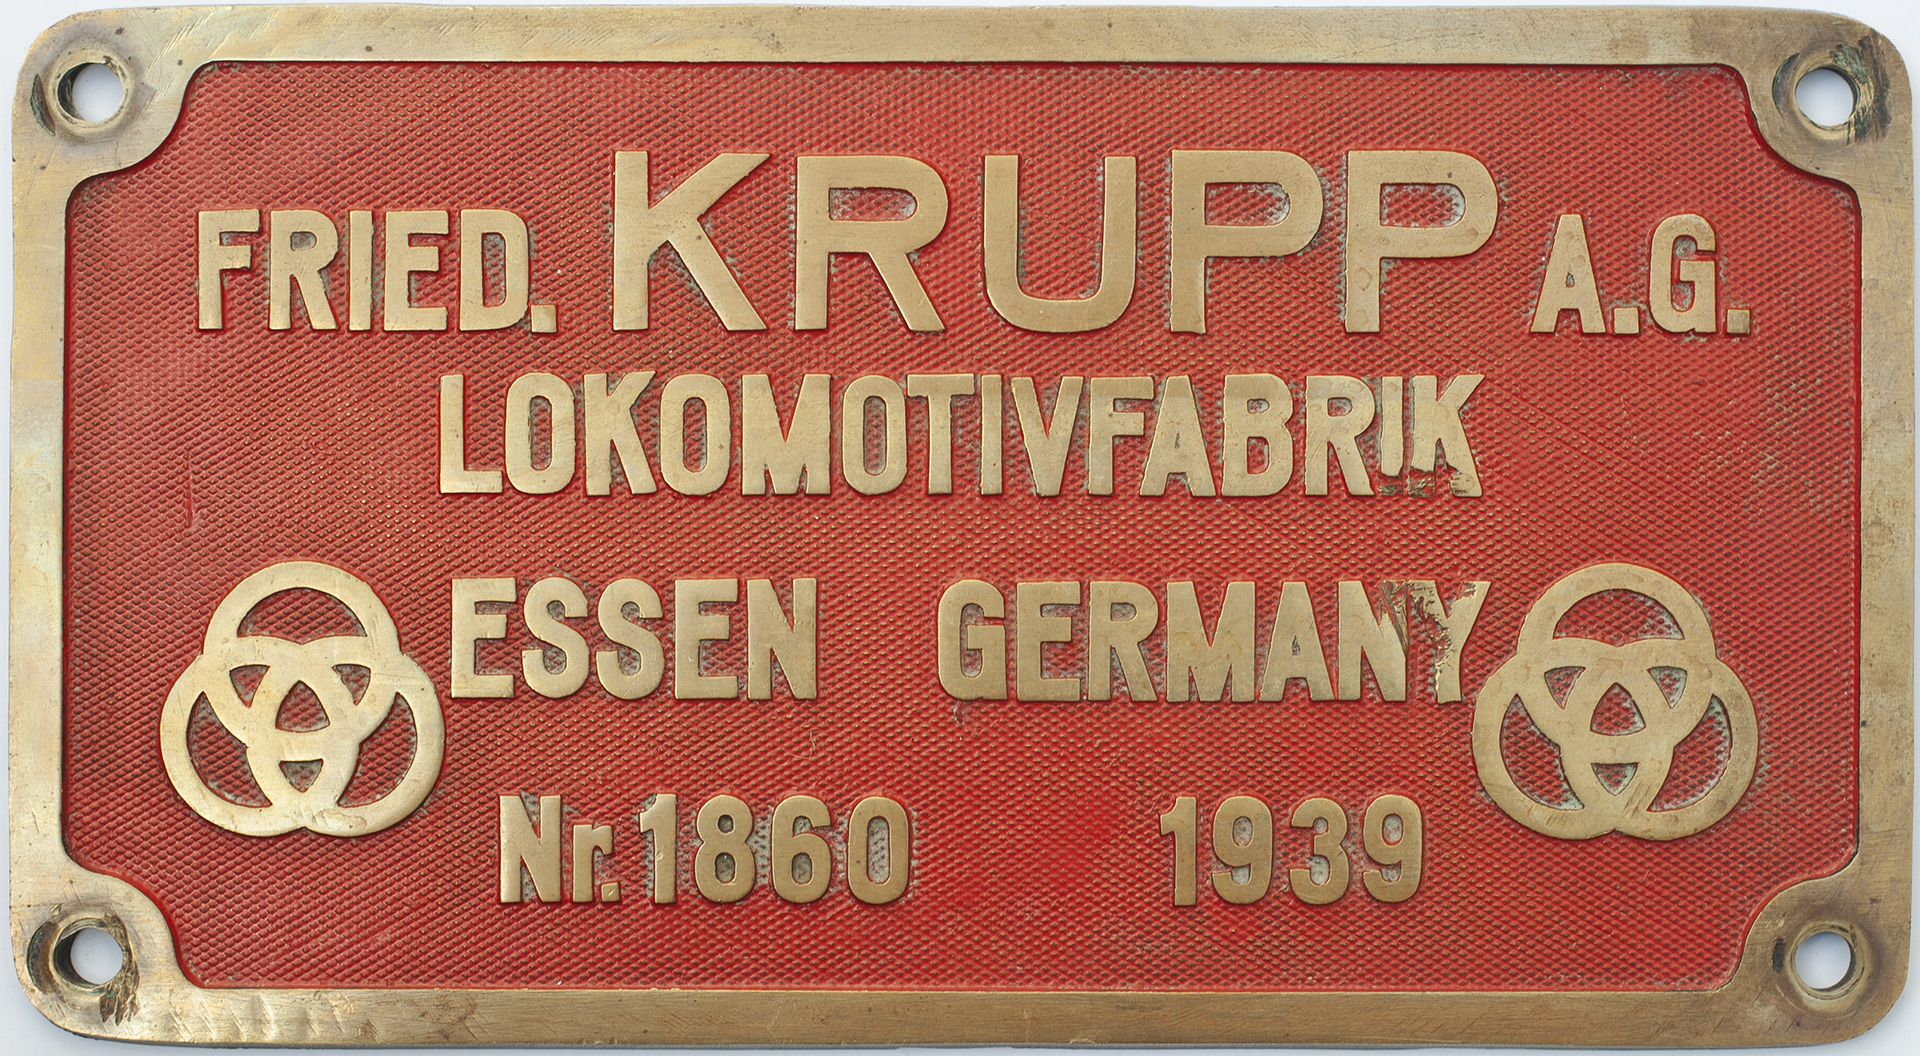 Worksplate FRIED.KRUPP A.G. LOKOMOTIVFABRIK ESSEN GERMANY Nr.1860 1939. Ex South African Railways